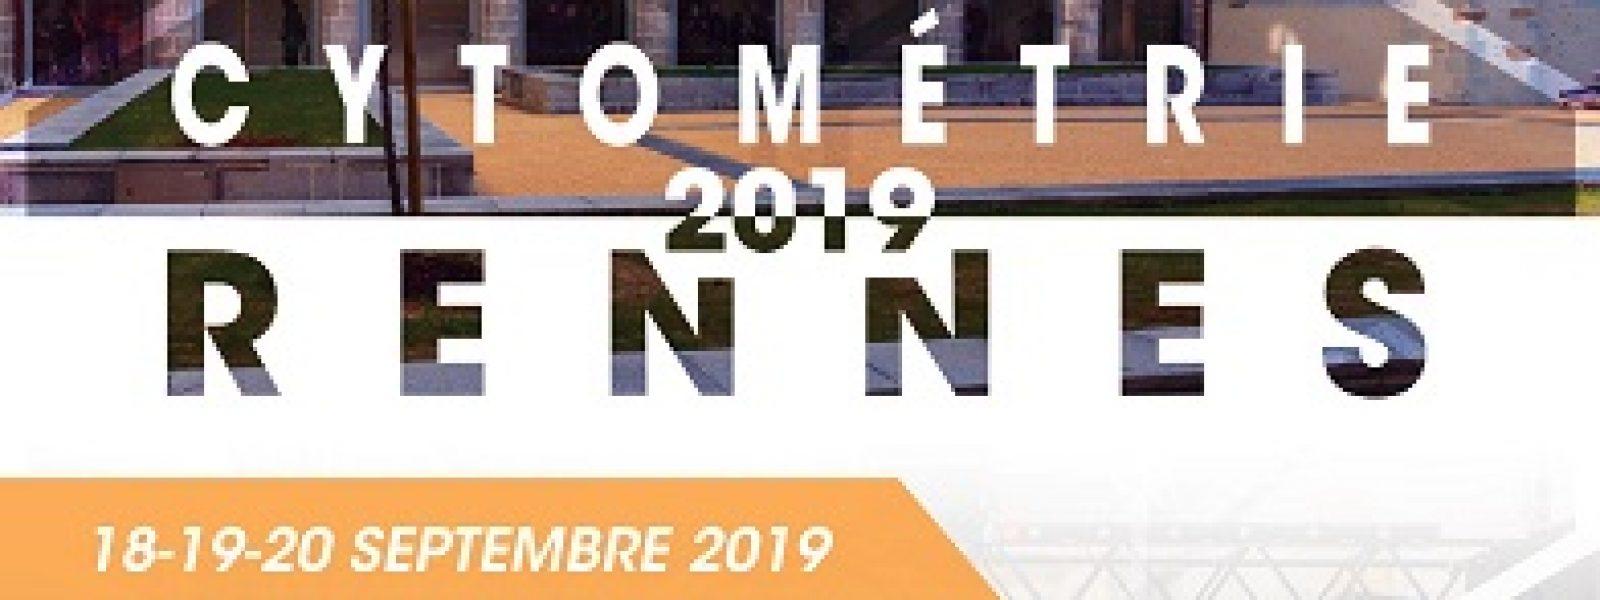 affiche-cytometrie-2019-rennes-congres